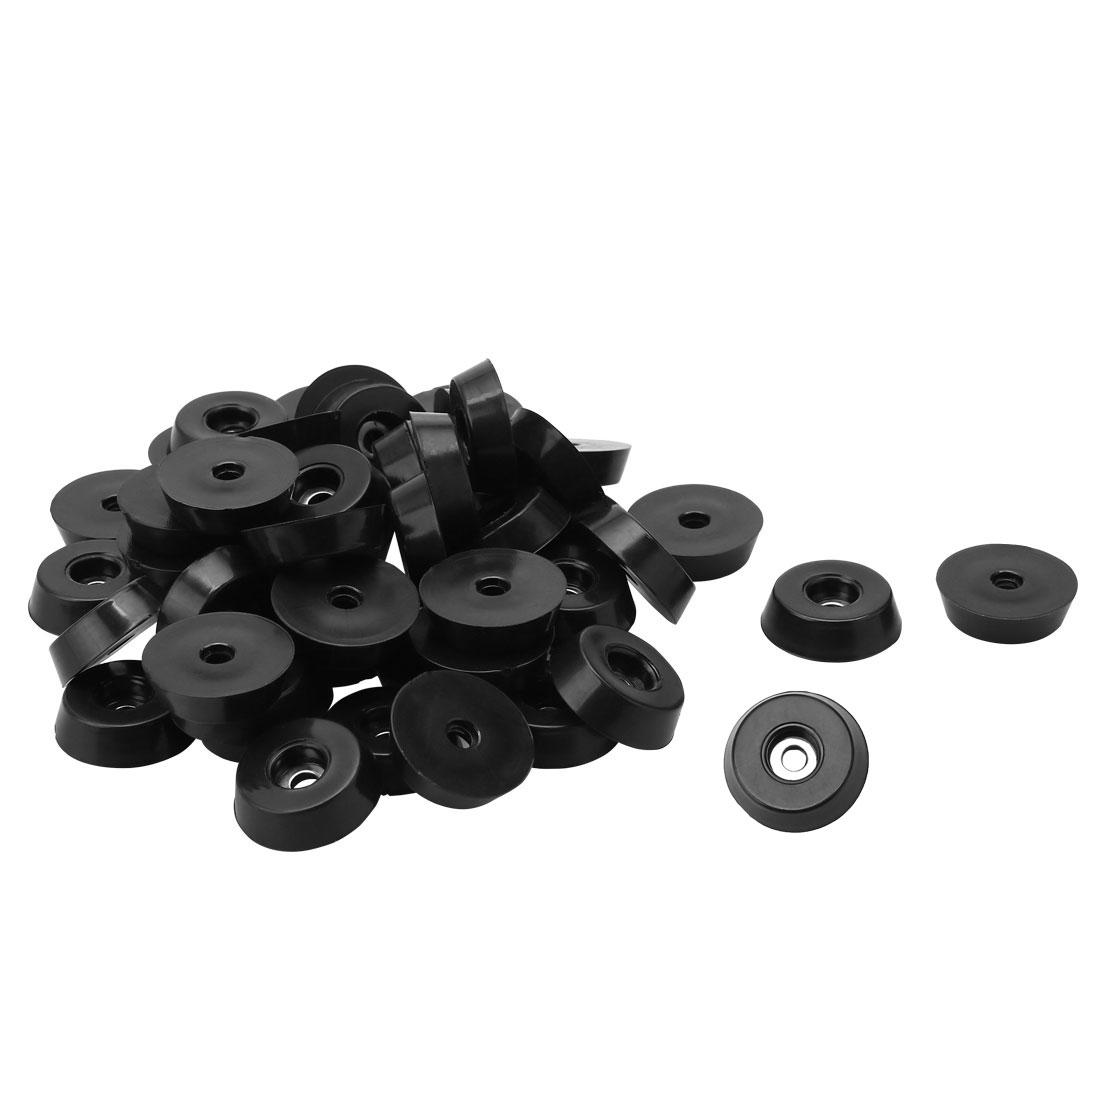 40pcs Rubber Feet Bumper Buffer Cutting Board Pad with Metal Washer, D18x15xH5mm - image 7 de 7